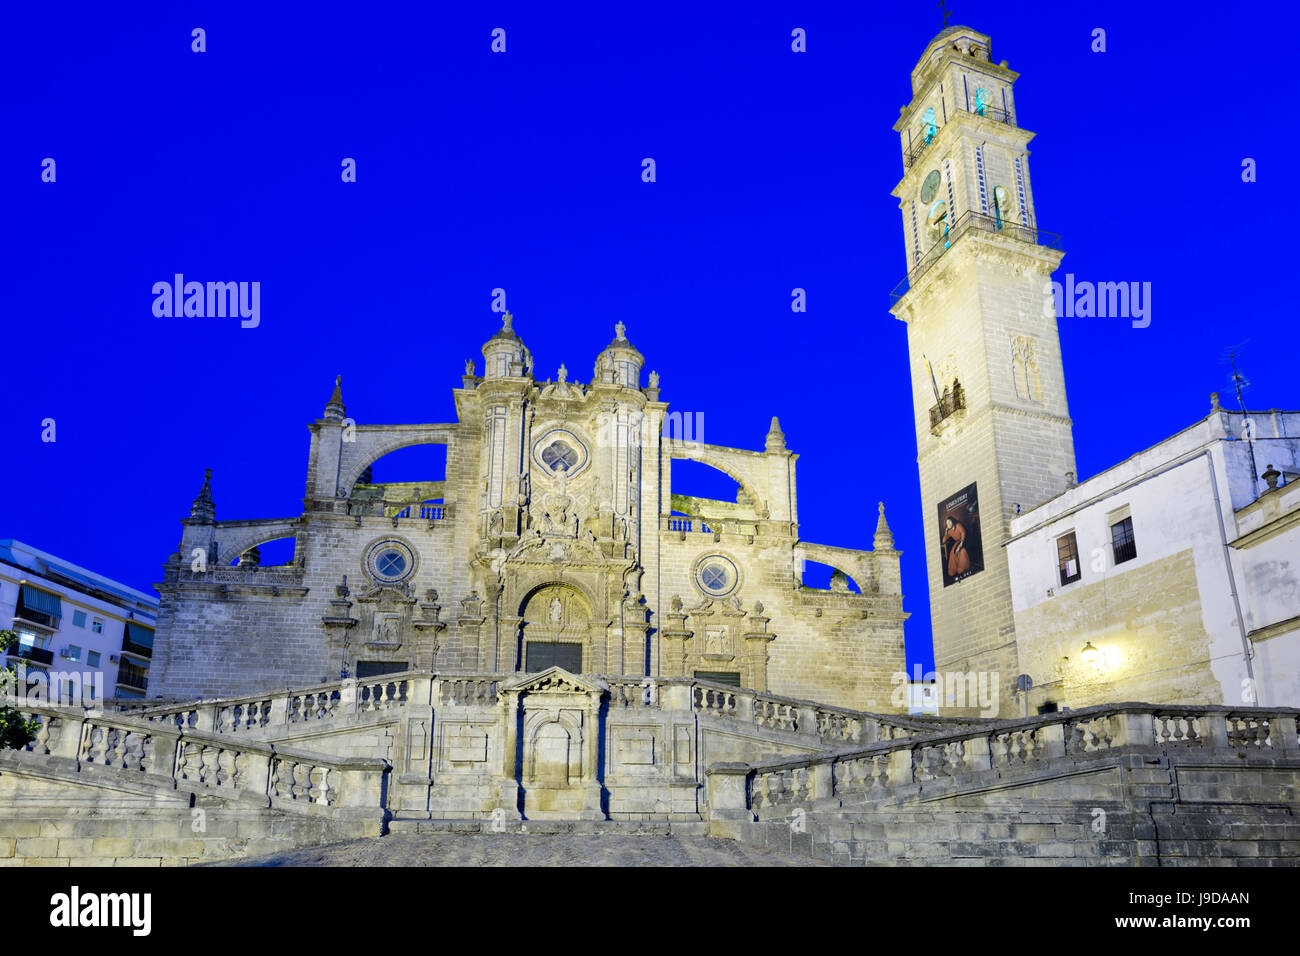 Jerez De La Frontera Kathedrale bei Nacht, Jerez De La Frontera, Cadiz Provinz, Andalusien, Spanien, Europa Stockbild